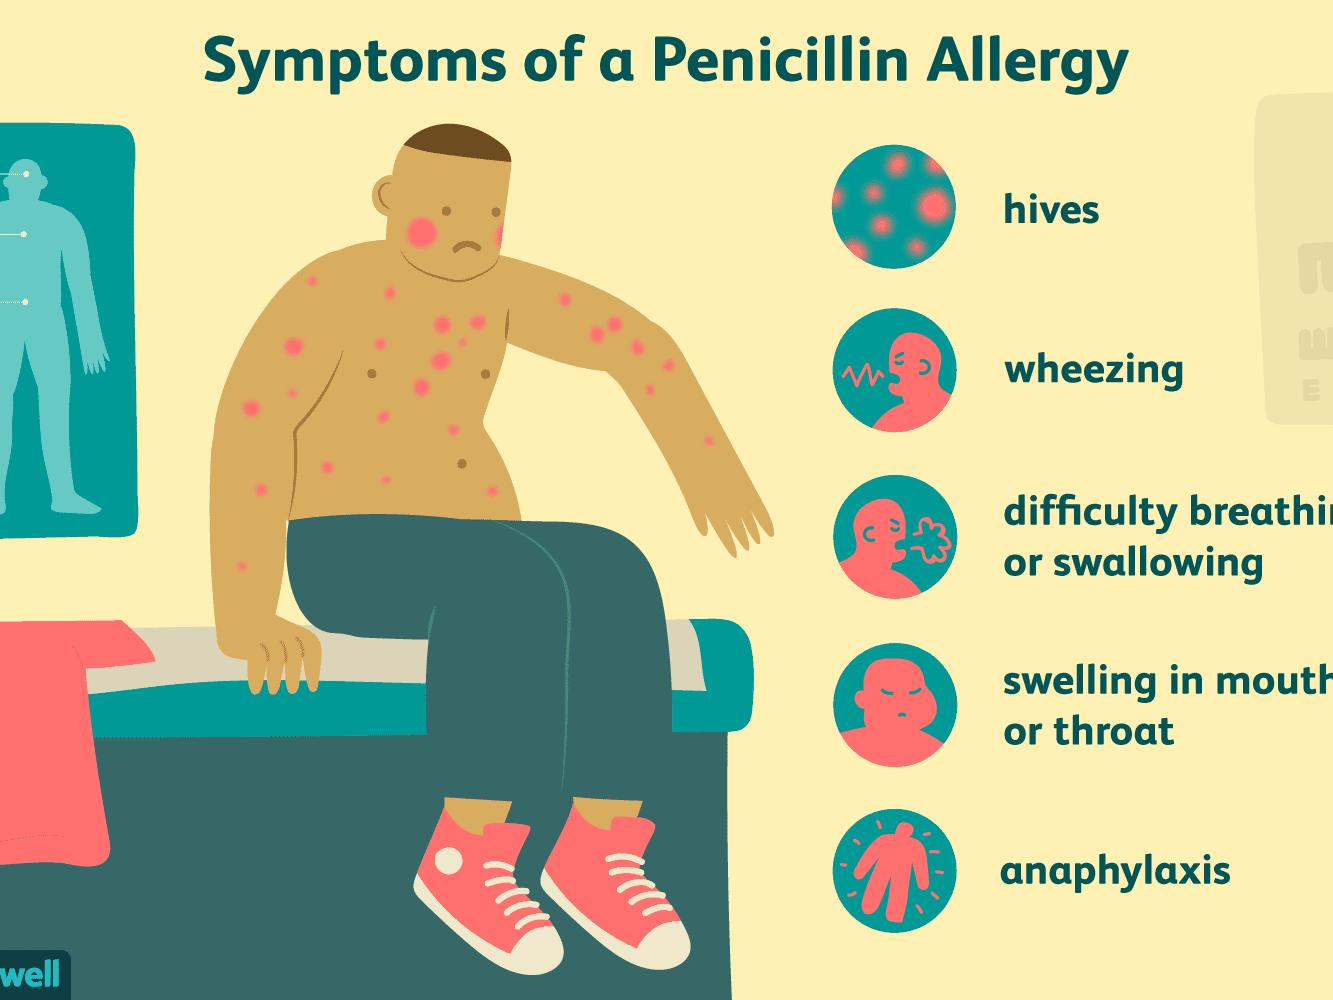 steroid shot for allergic reaction to antibiotics